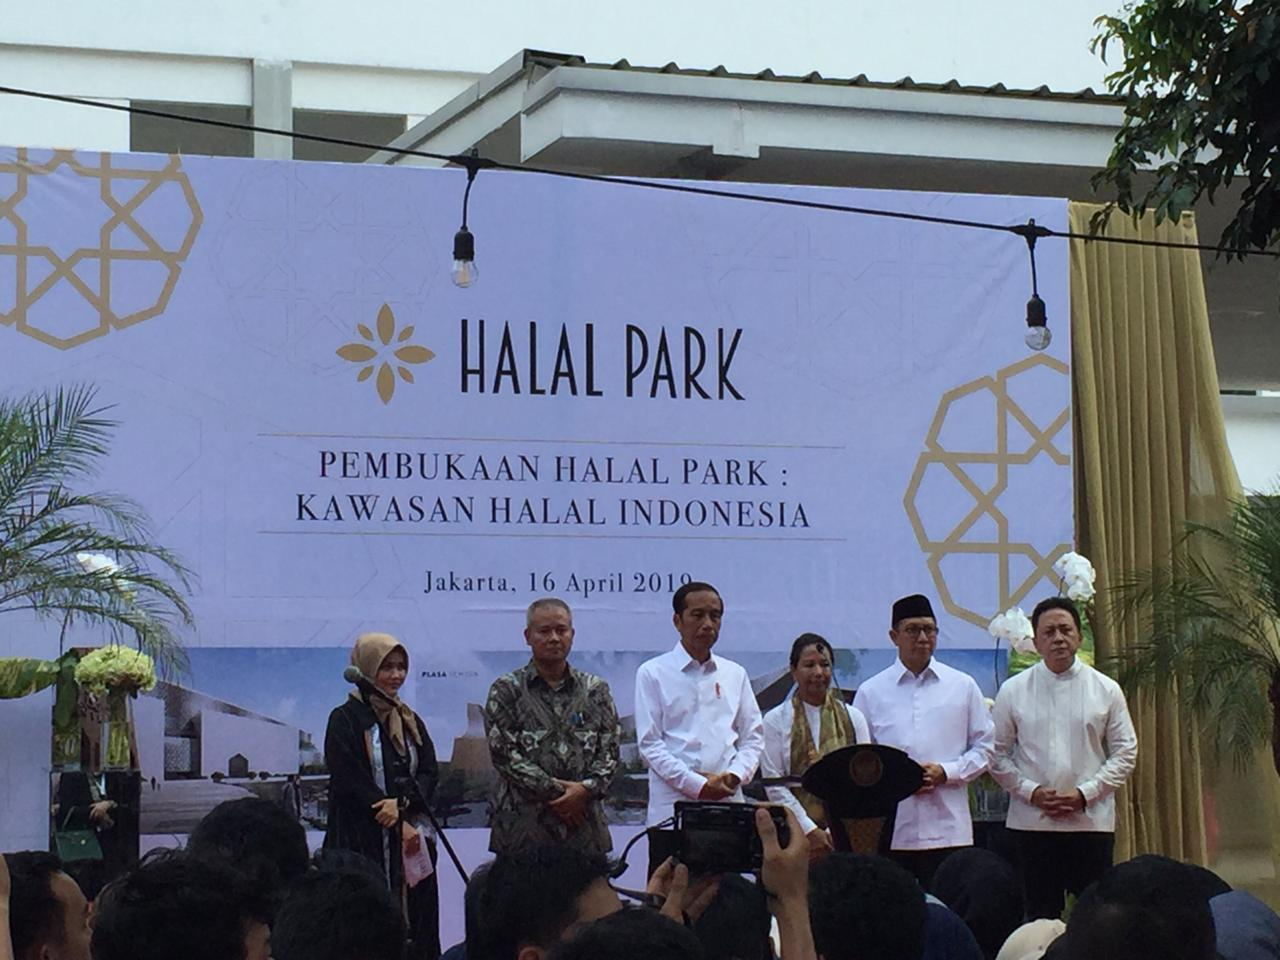 https: img-o.okeinfo.net content 2019 04 16 320 2044108 pulang-umroh-presiden-jokowi-langsung-resmikan-miniatur-halal-park-dWC6jEkXh8.jpg